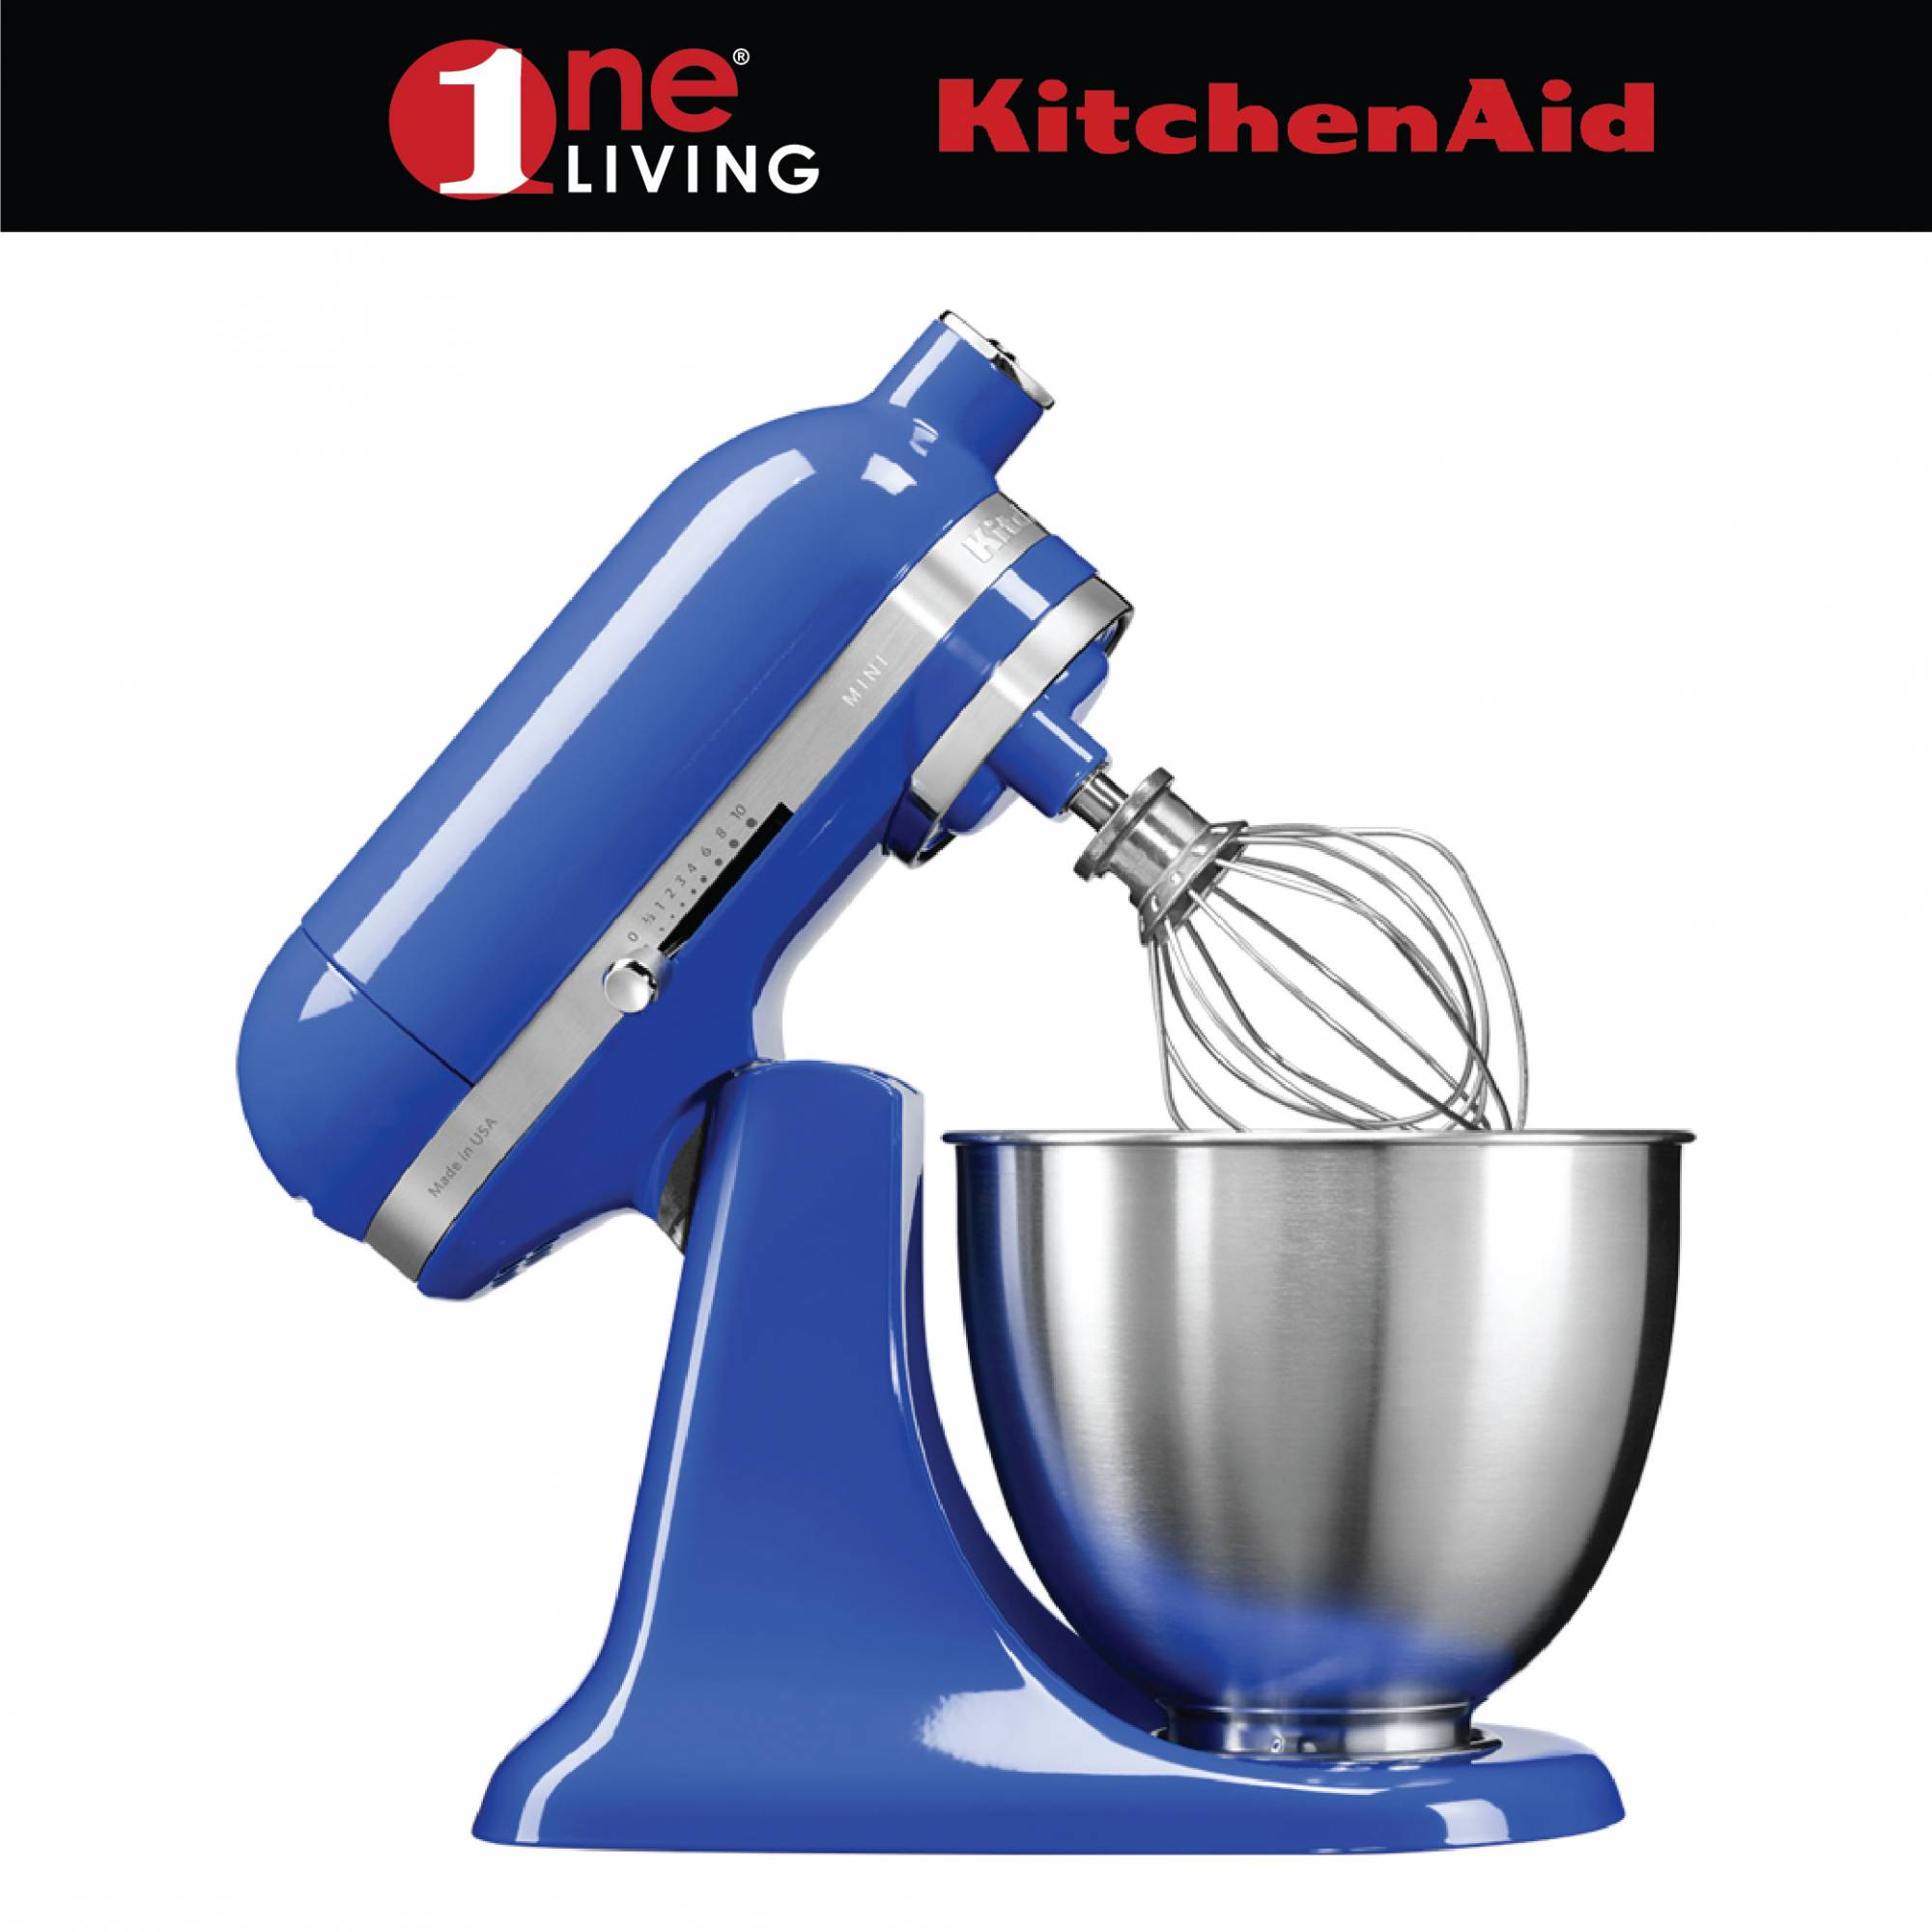 Kitchenaid 3 3l Artisan Mini Stand Mixer 5ksm3311xb